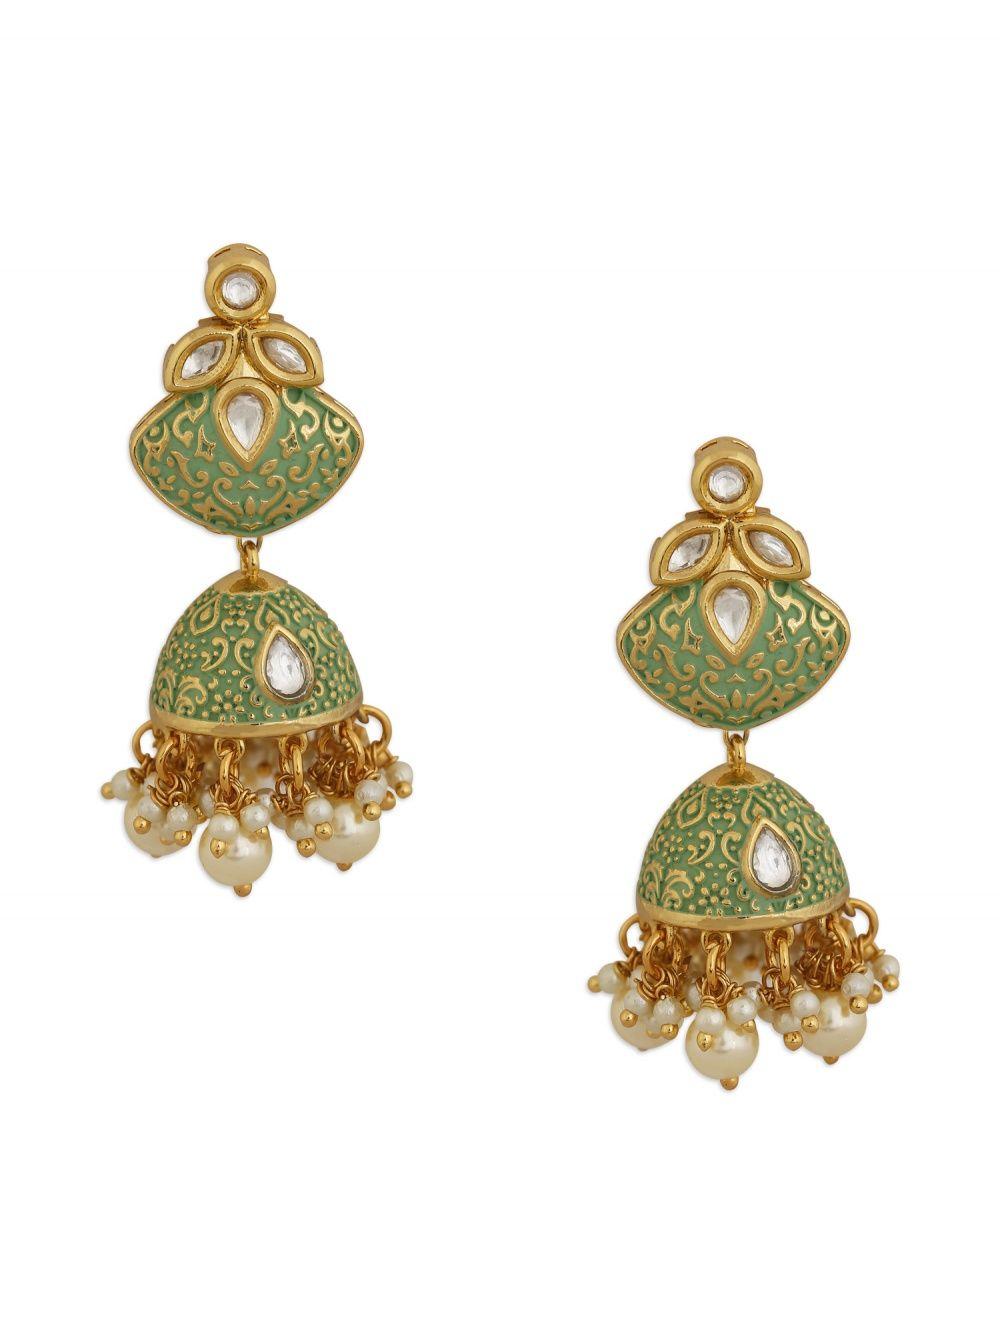 f5c84980a68dc Zulree by Harvi Mudra Earrings